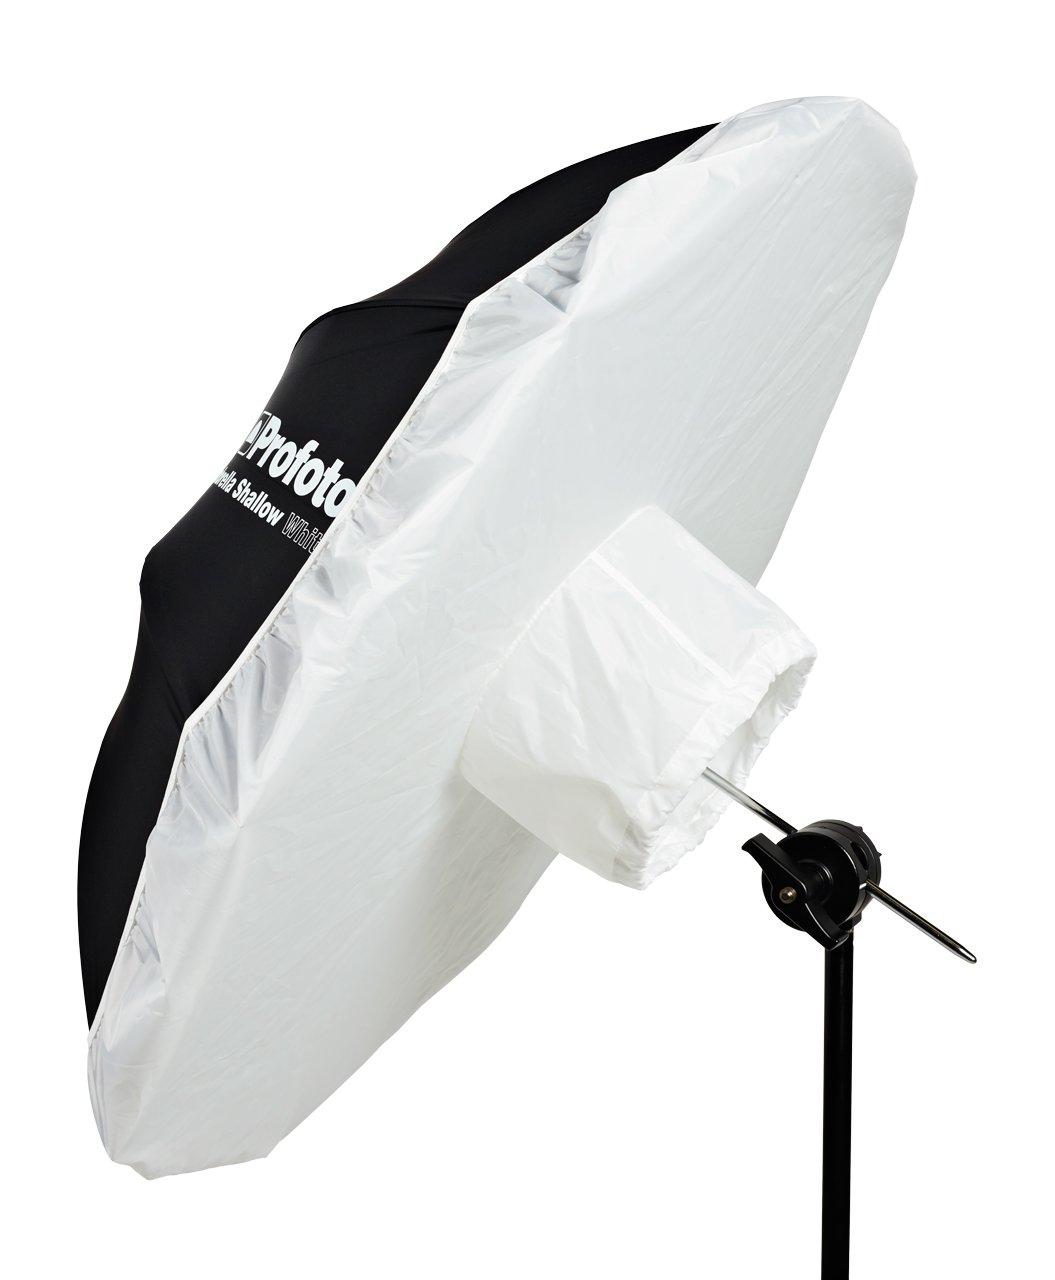 Profoto Umbrella Diffuser - Large 100992 by Profoto